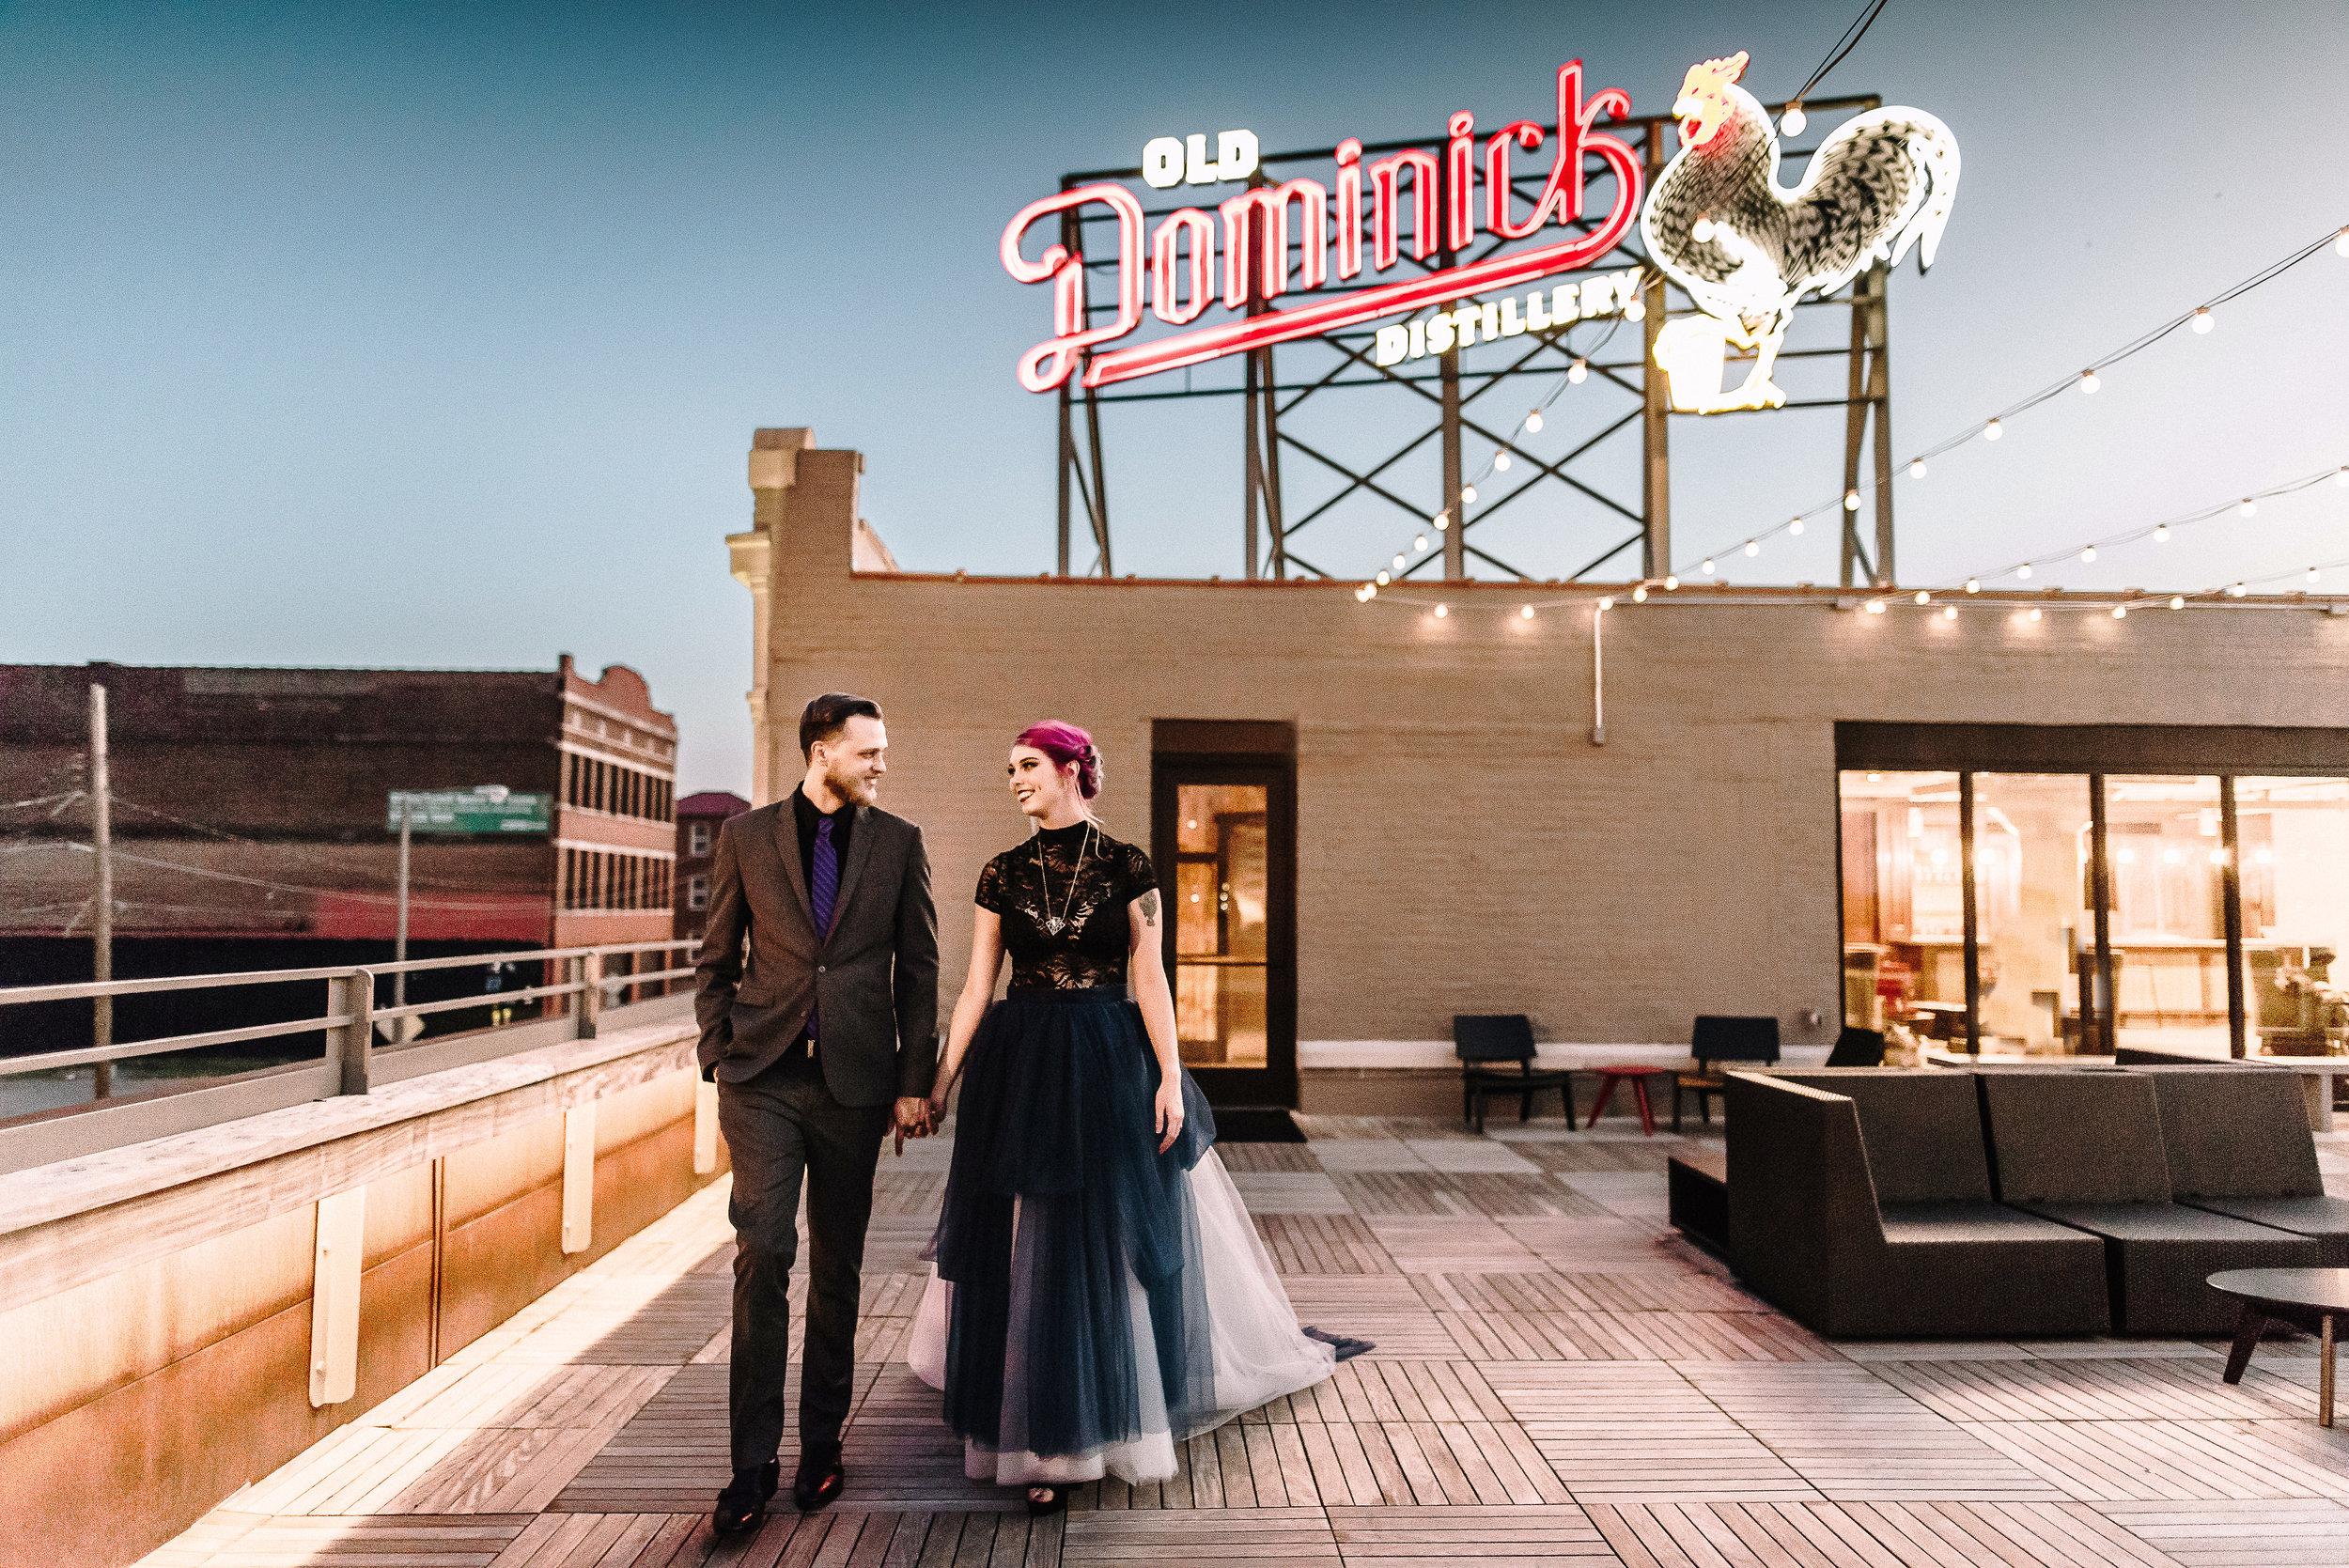 Old-Dominick-Distillery_Ashley-Benham-Photography-278-2.jpg